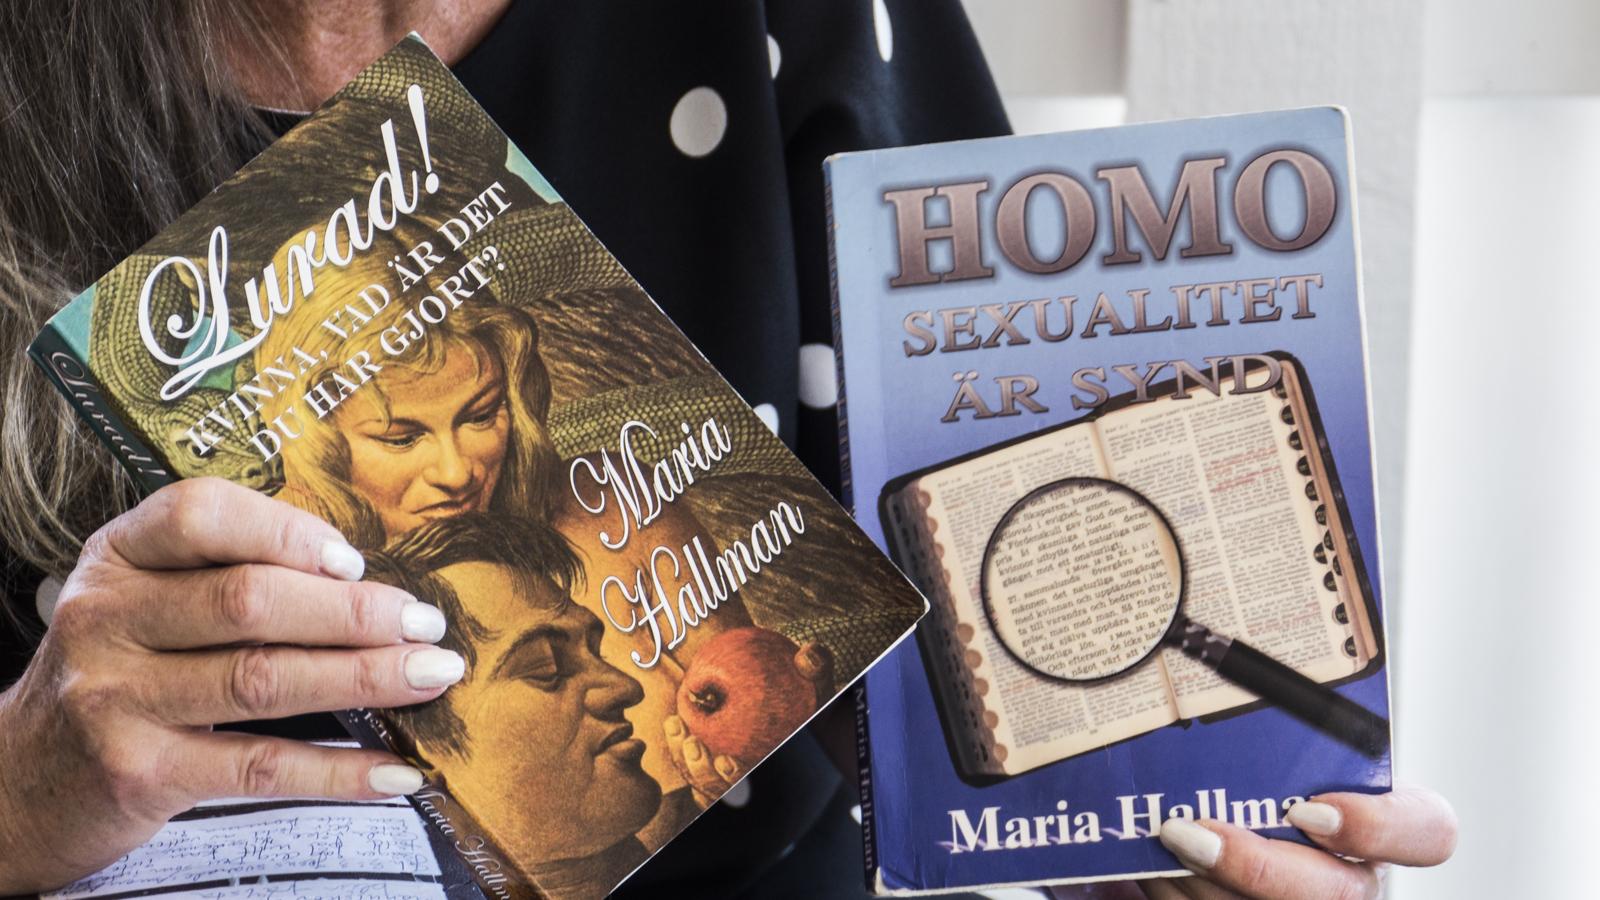 Maria hallman homosexualitet